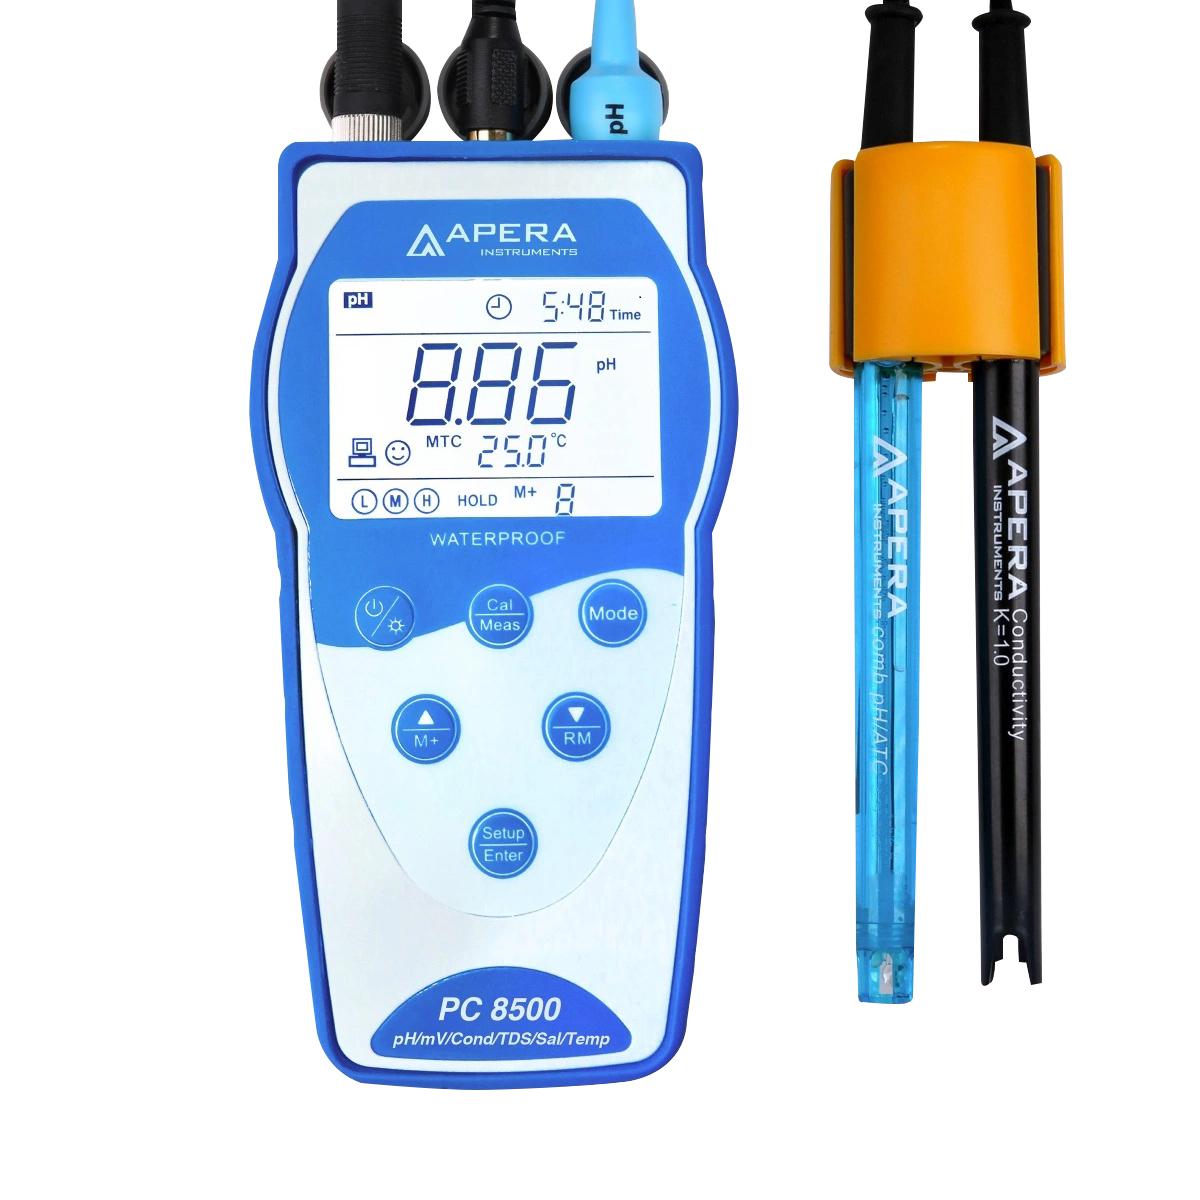 ph-portatil-mediciones-en-campo